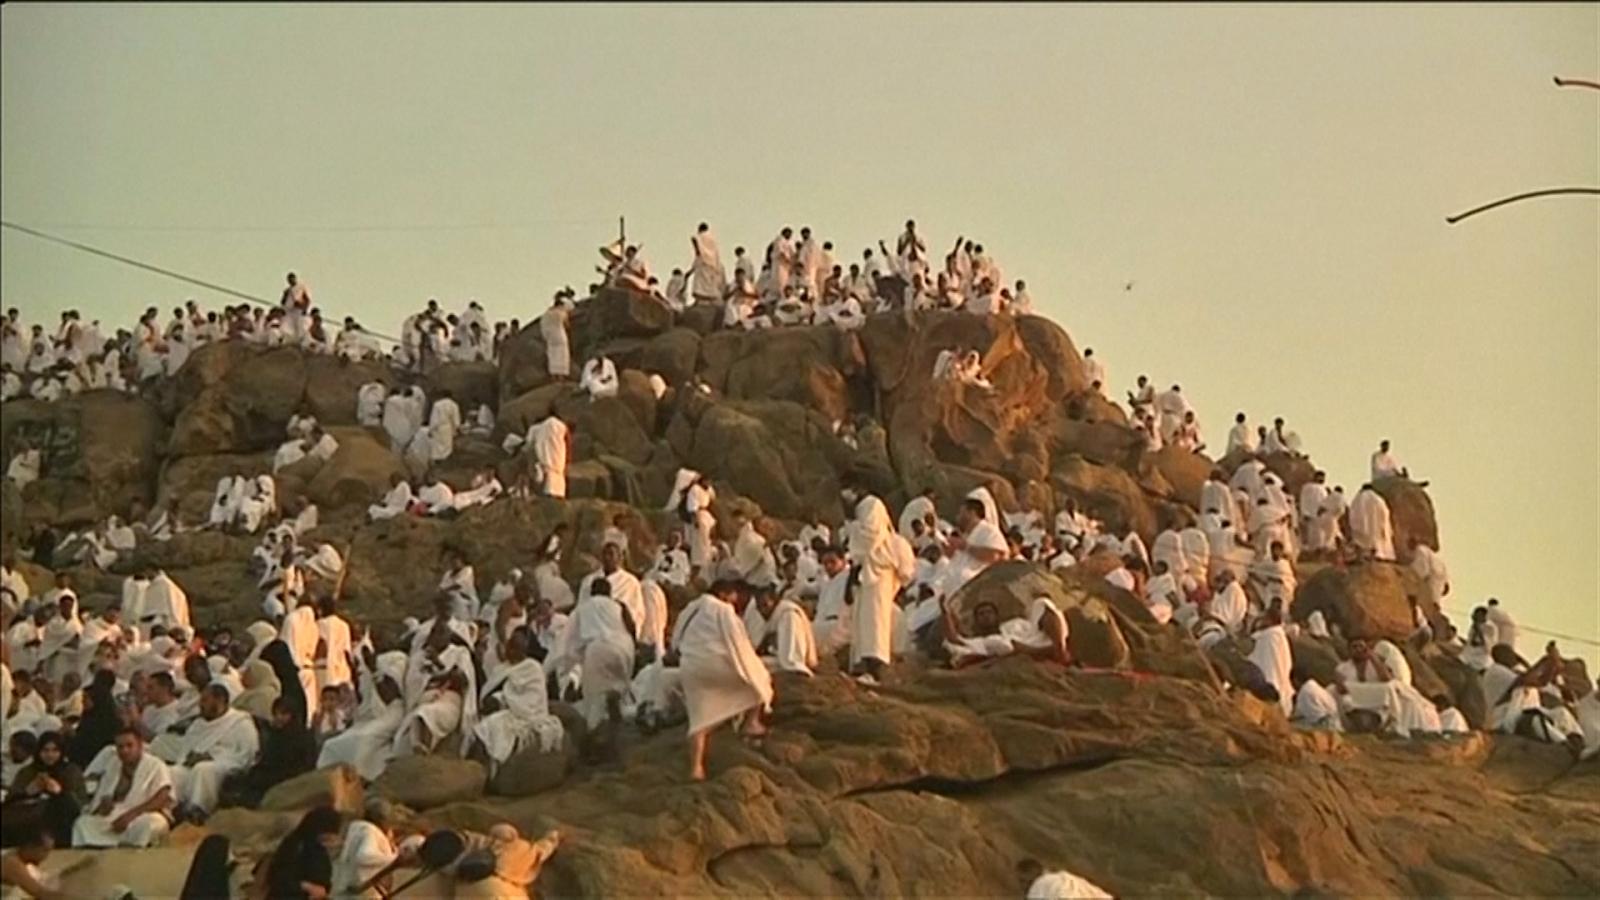 Muslim Wallpaper Hd Nearly Two Million Hajjis Gather At Mount Arafat